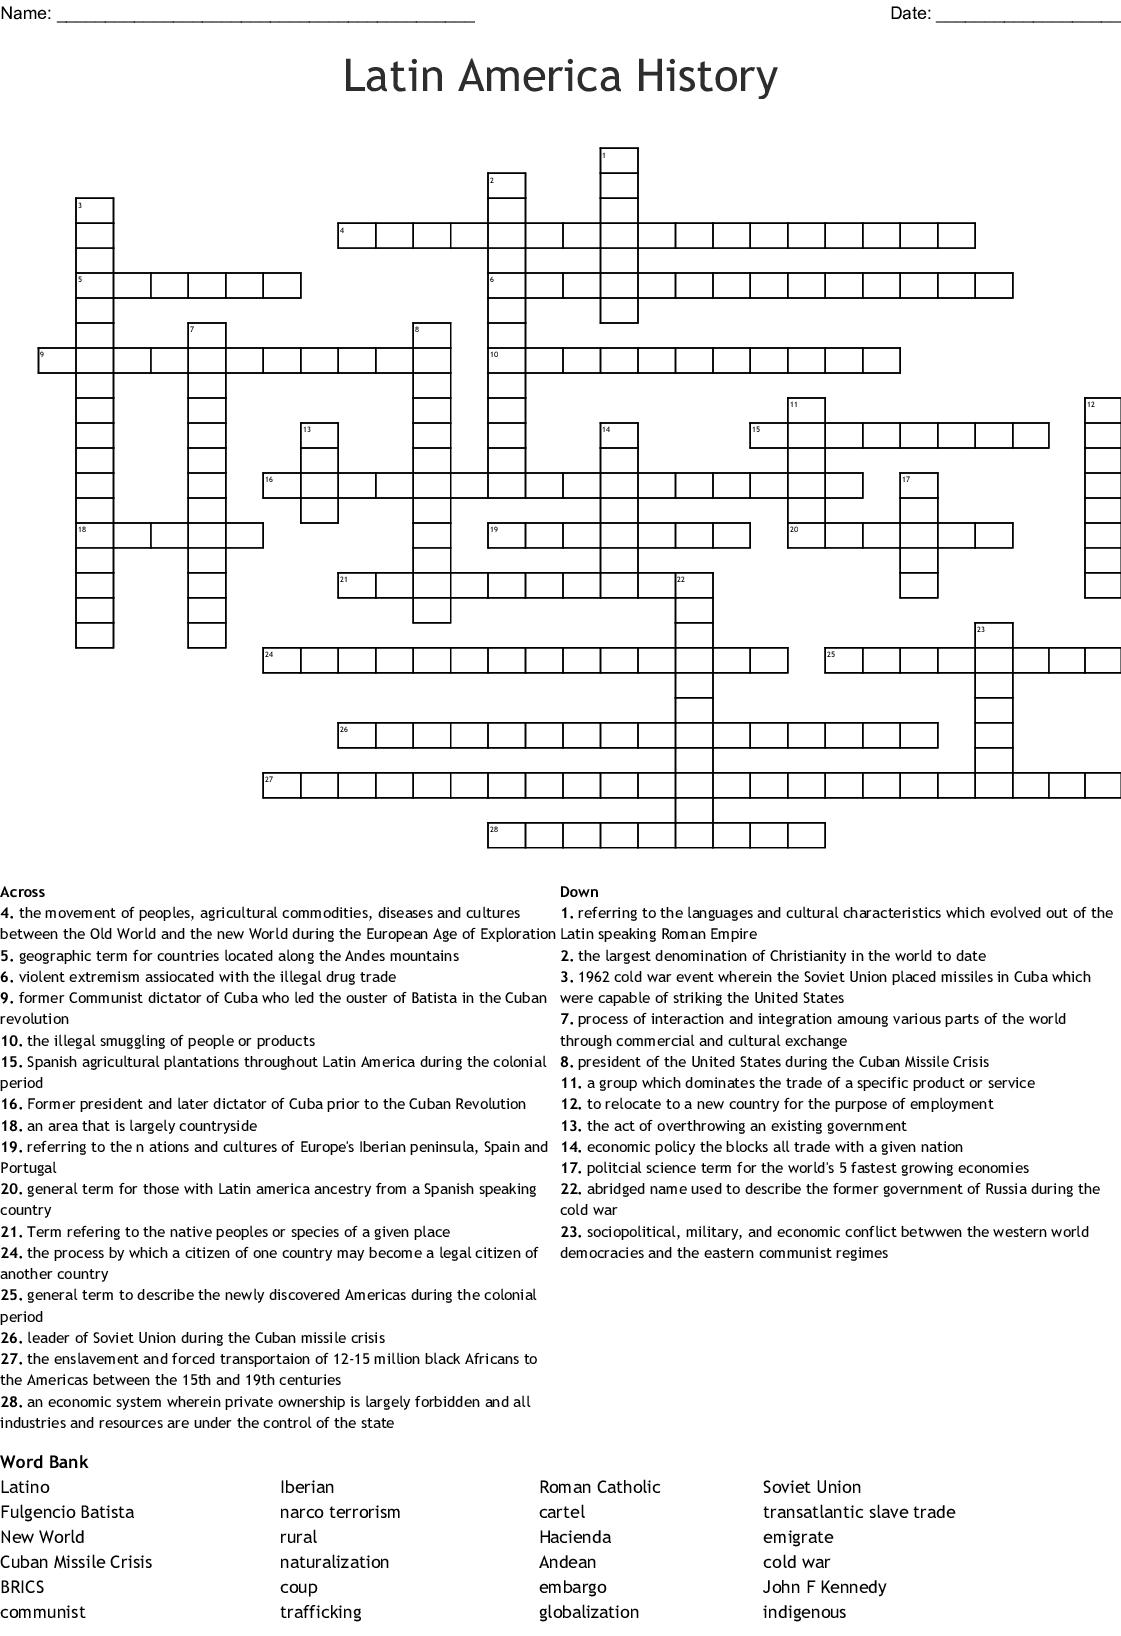 Latin America History Crossword